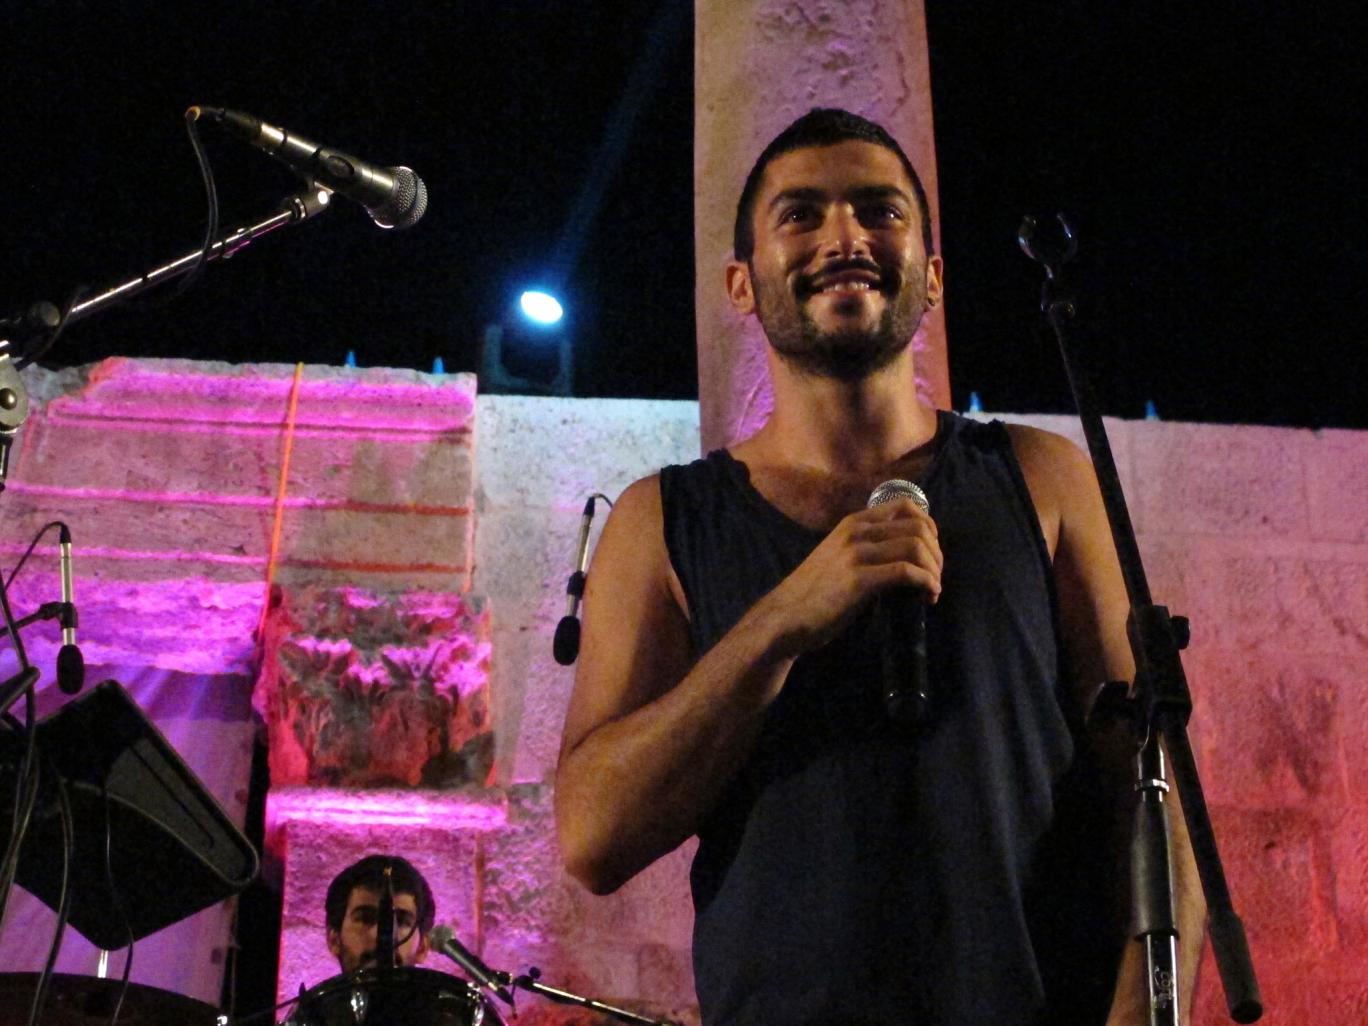 Hamed Sinno, lead singer and song writer of the Lebanese group Mashrou' Leila, whose fans were arrested AP